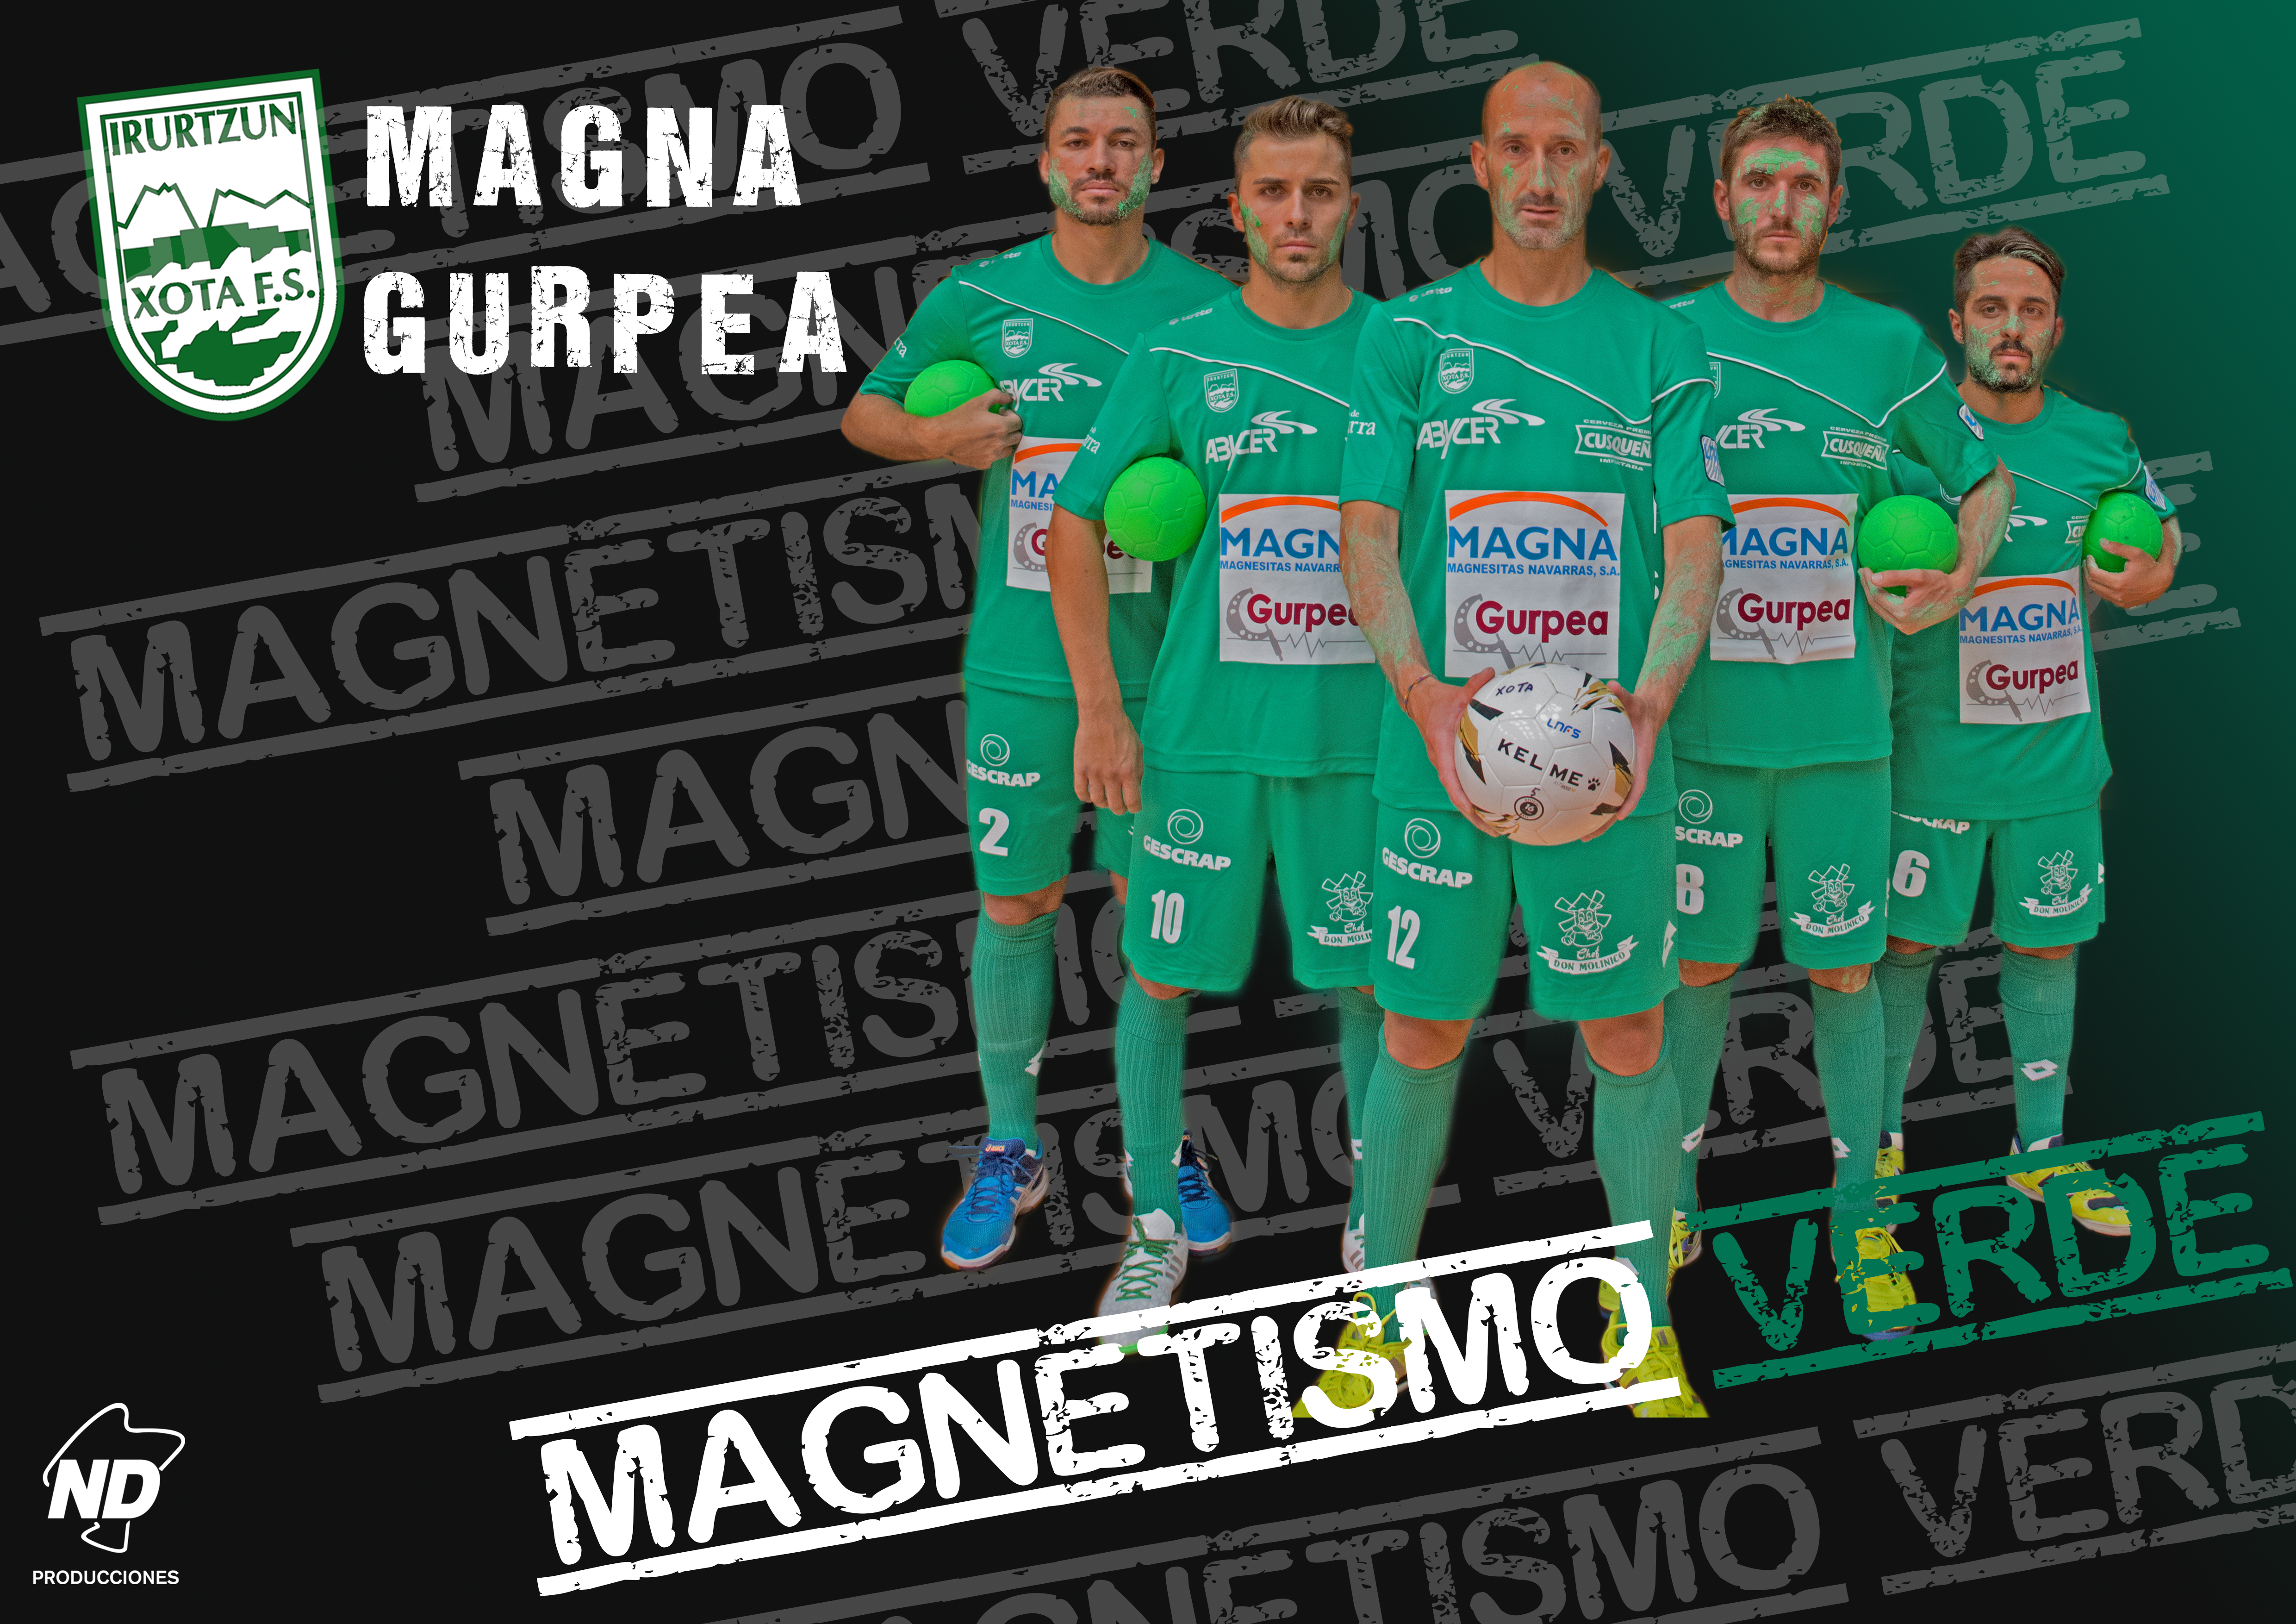 MAGNETISMO VERDE!!